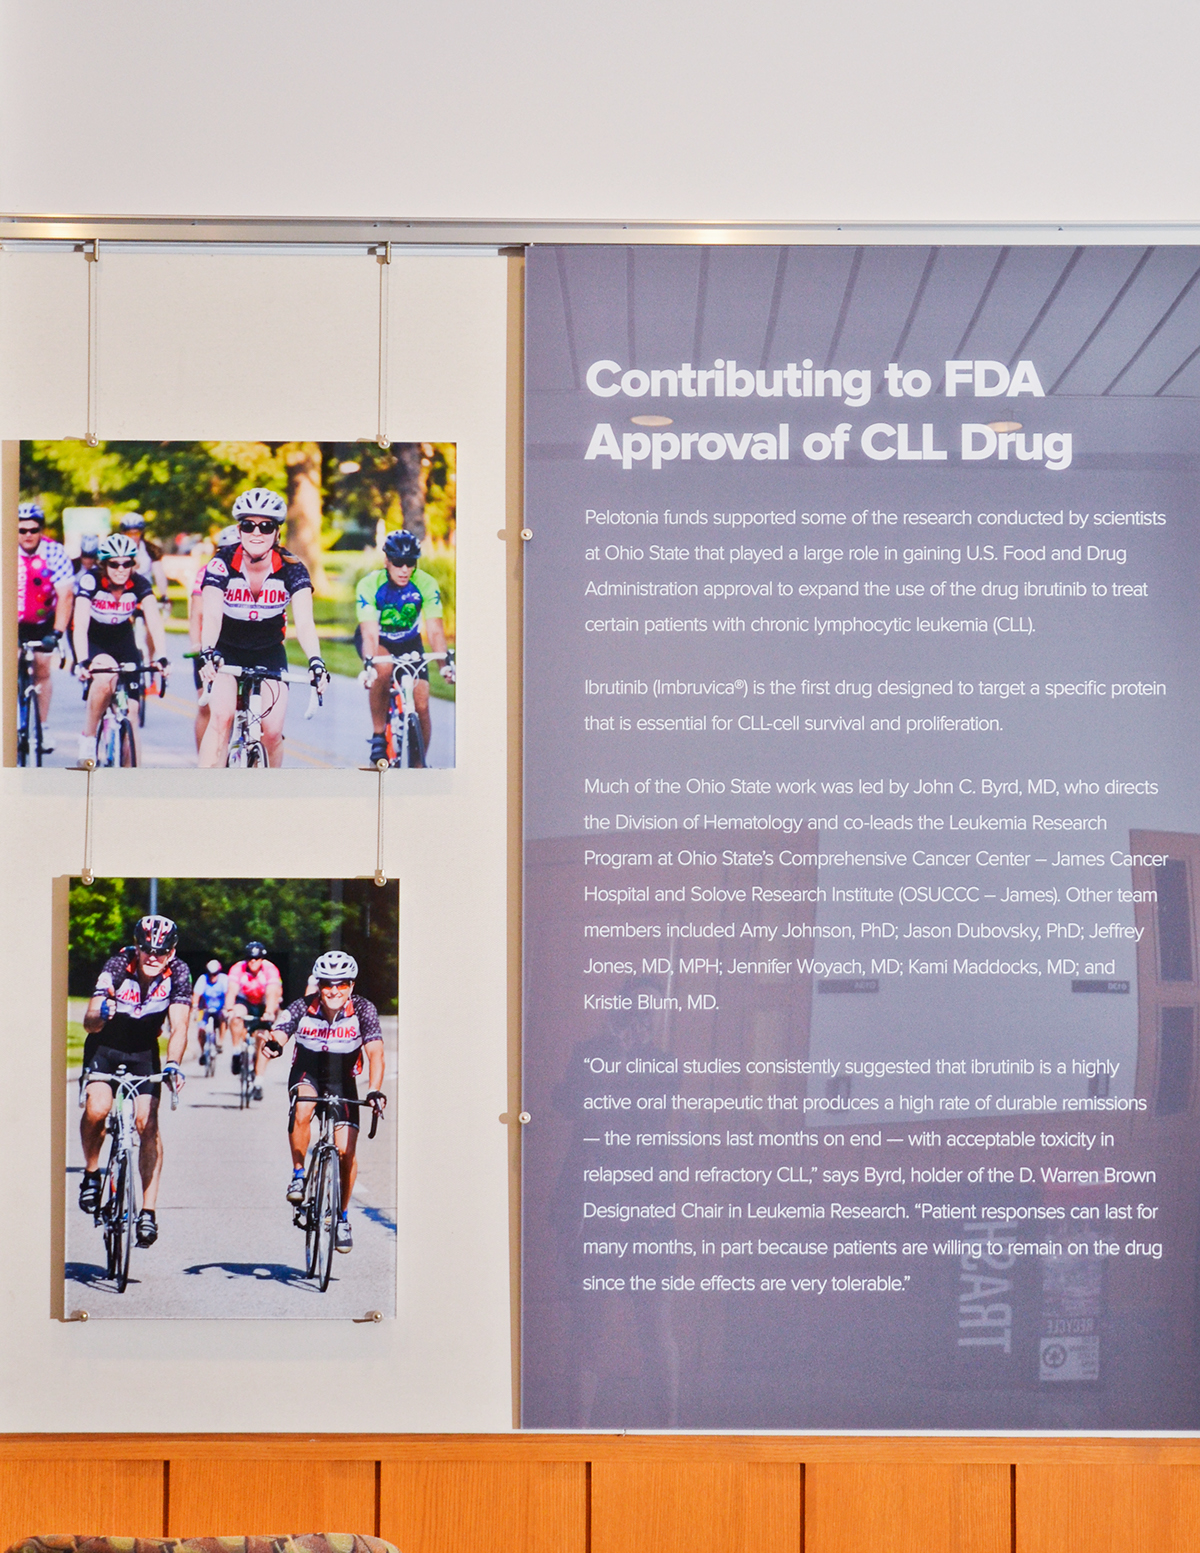 photo charity pelotonia Team Buckeye Biomedical Research wall Cycling bikes ohio columbus acrylic acrylic print print The James one goal